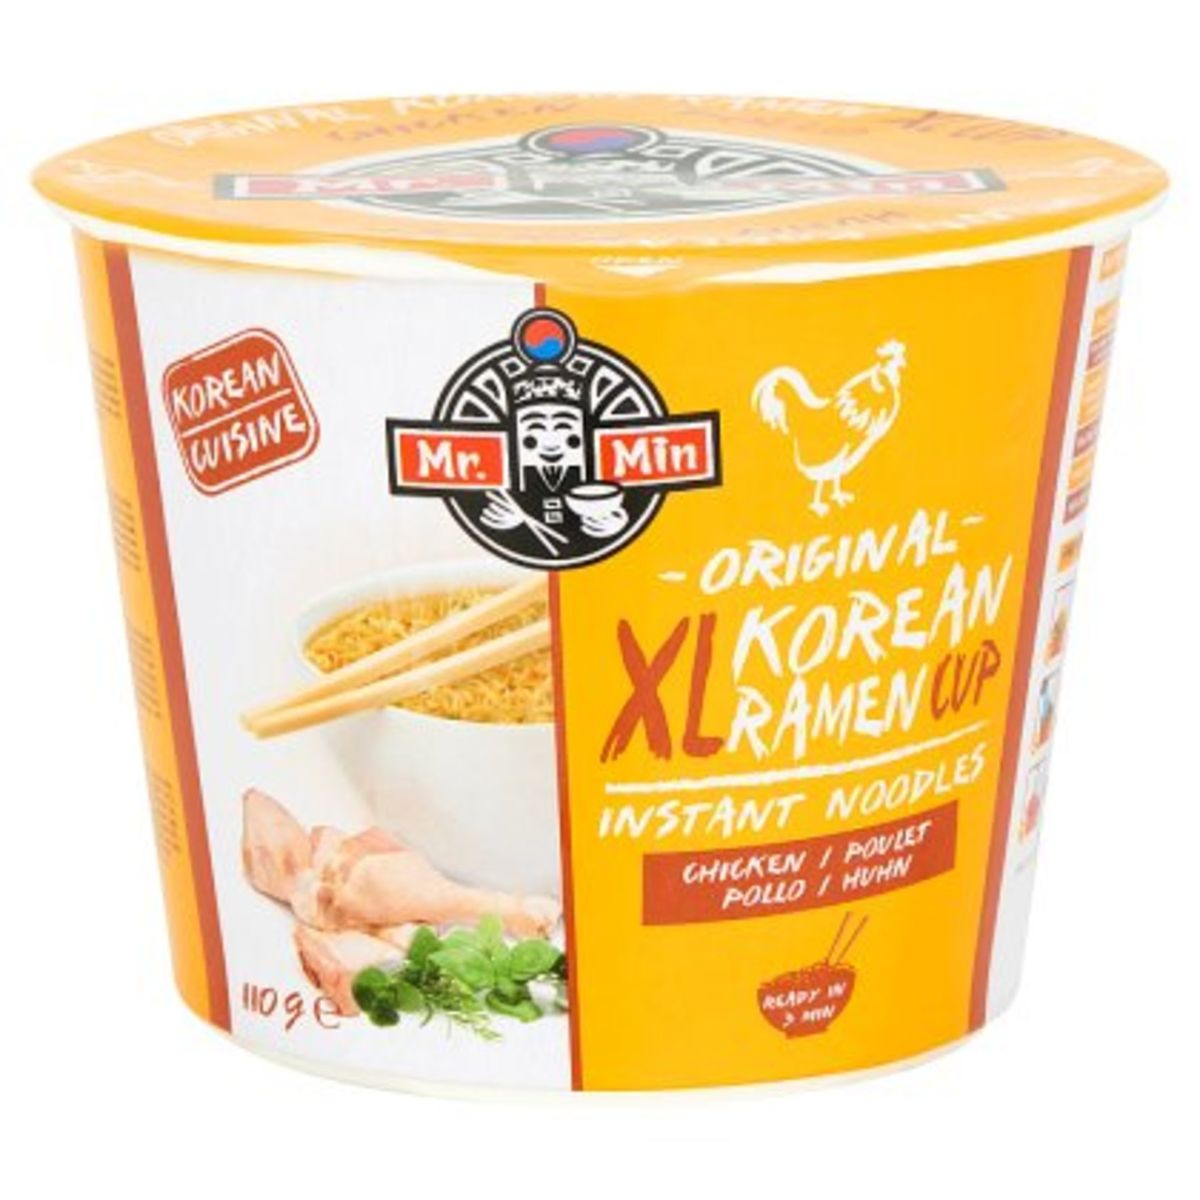 Mr. Min Original Korean Ramen Cup XL Instant Noodles Chicken 110 g